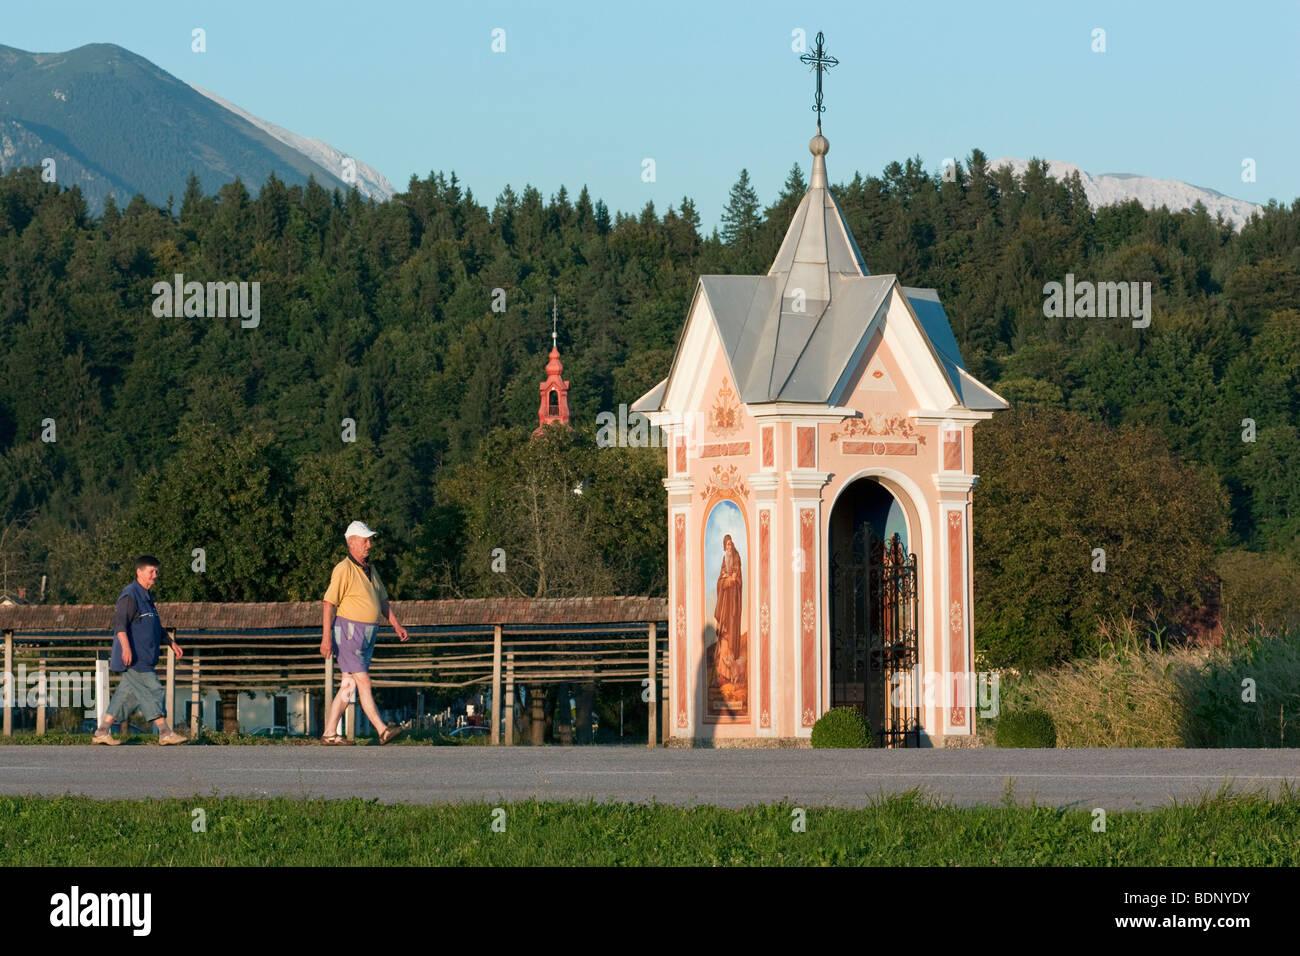 Eine slowenische paar geht vorbei an einer aufwendigen Bildstock in Spodnje Duplje, Slowenien. Stockbild